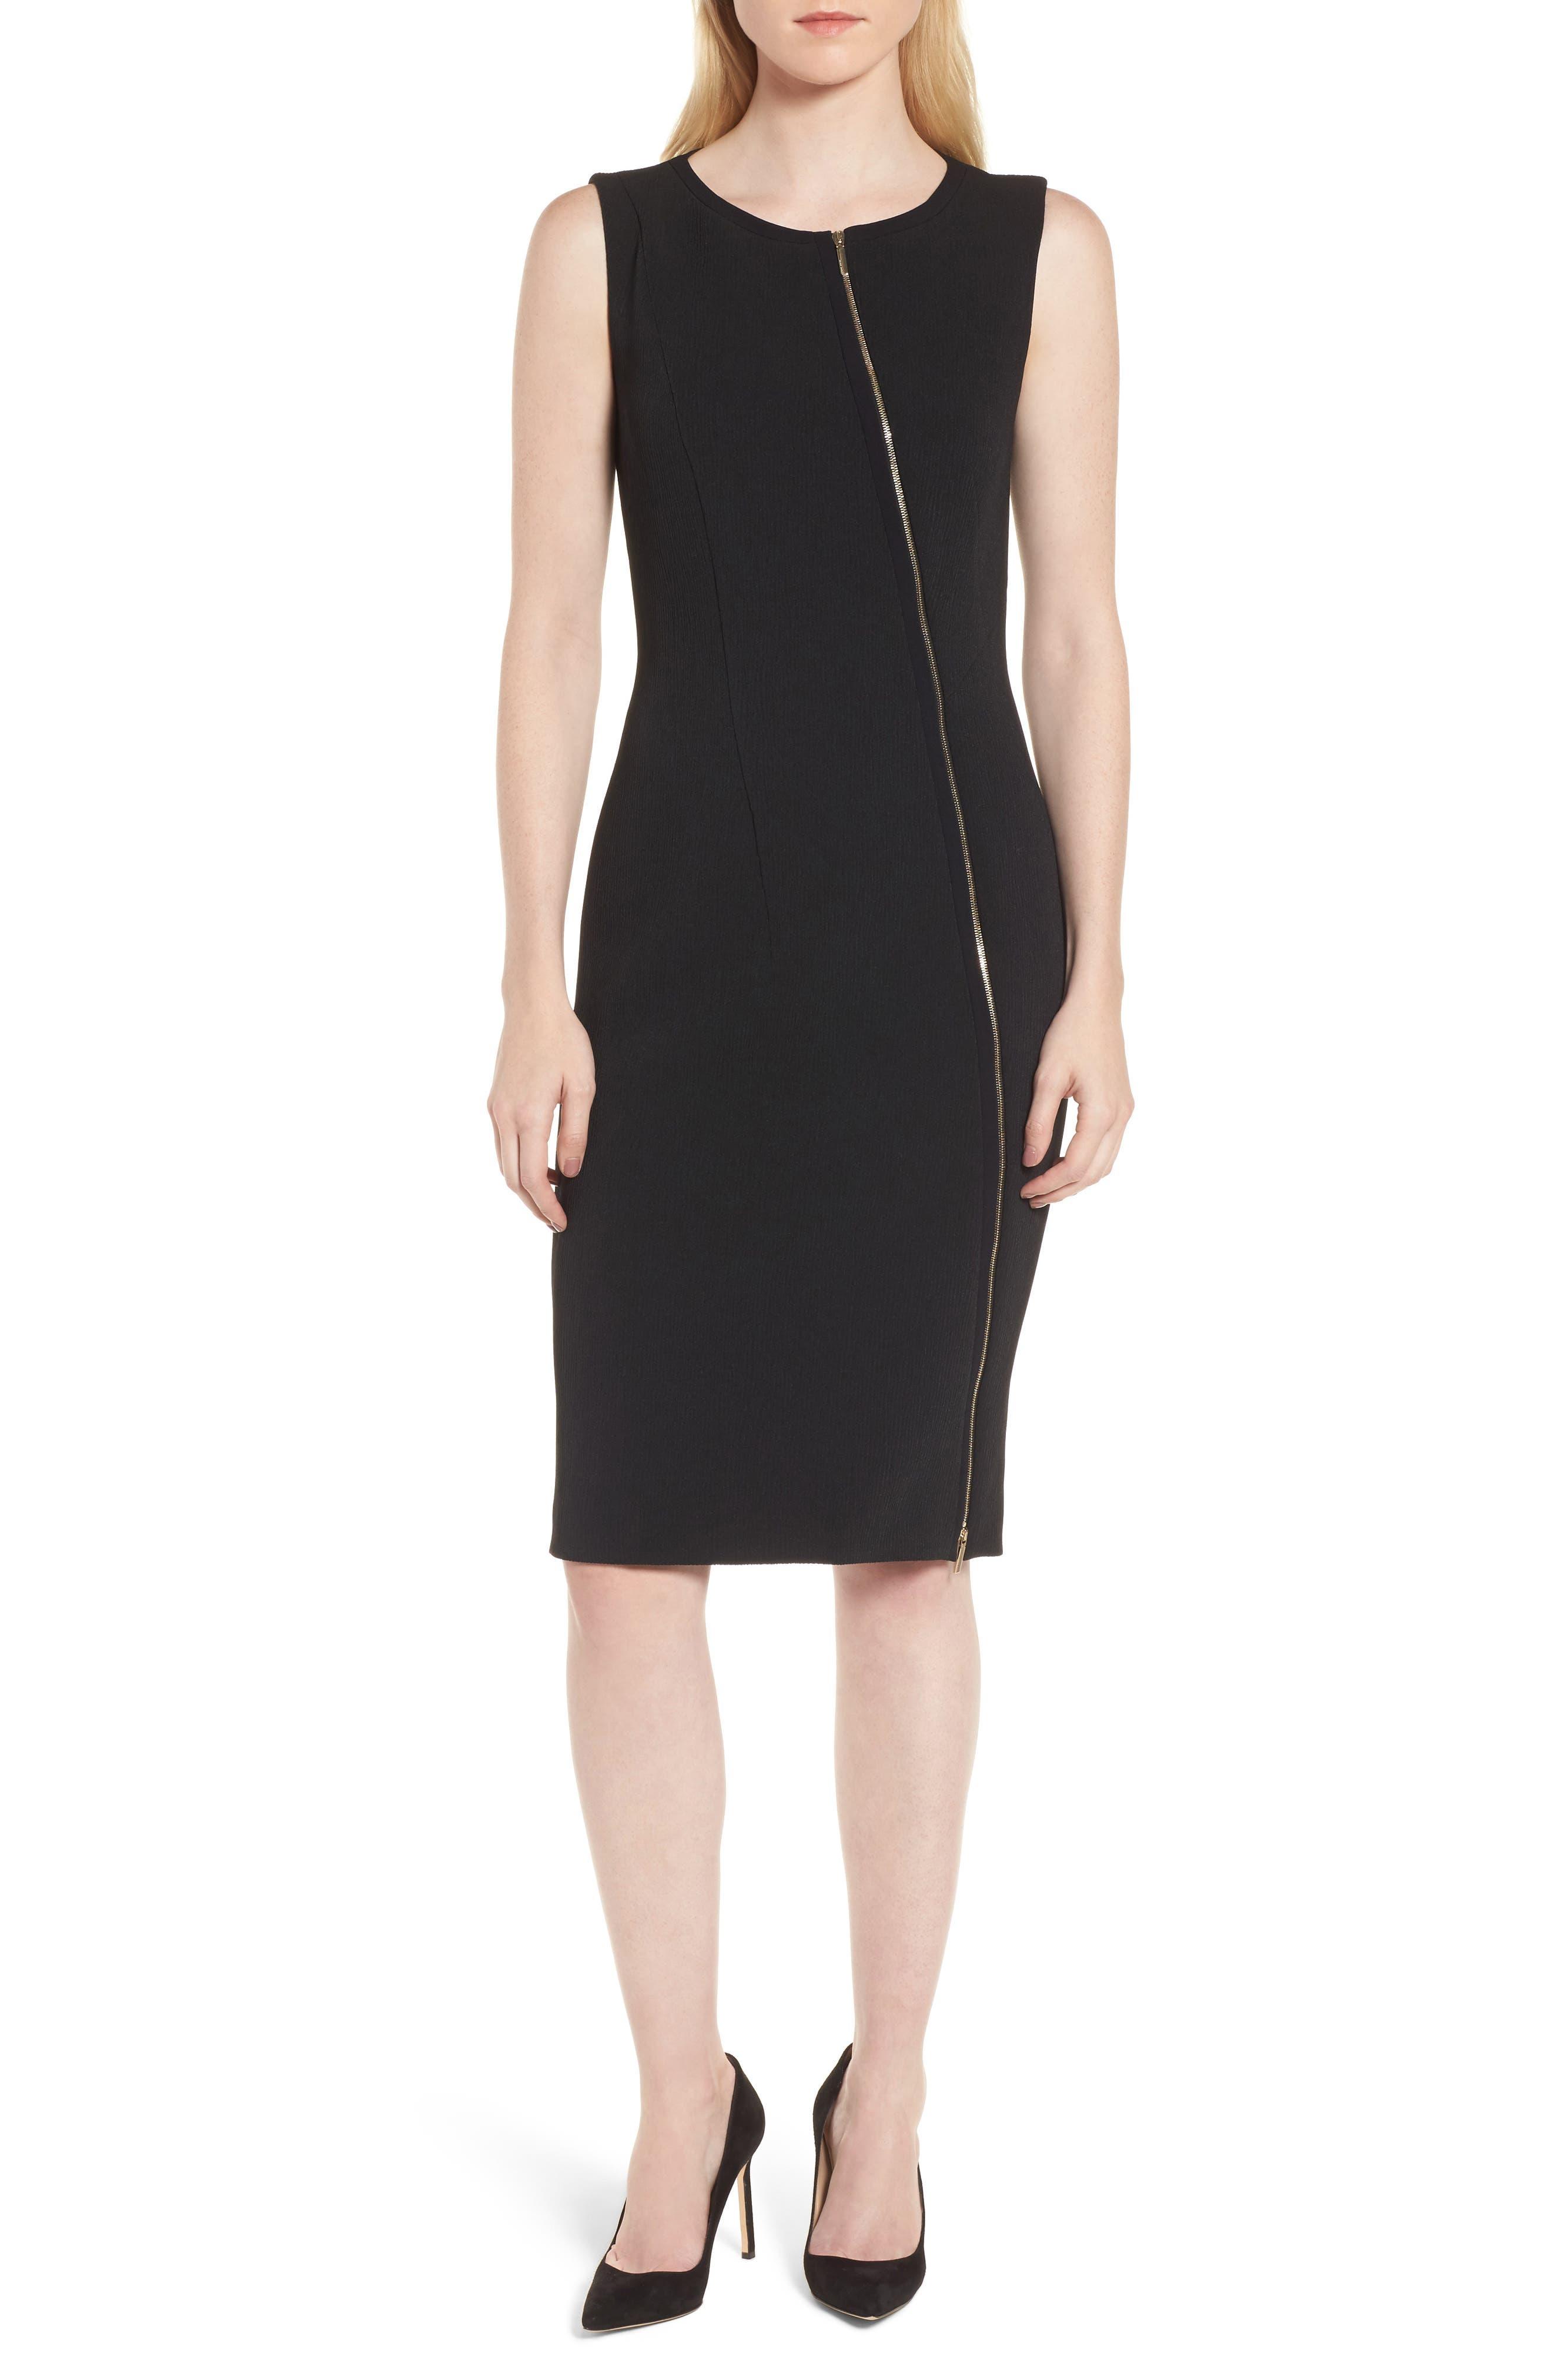 Danafea Dress,                         Main,                         color, Black